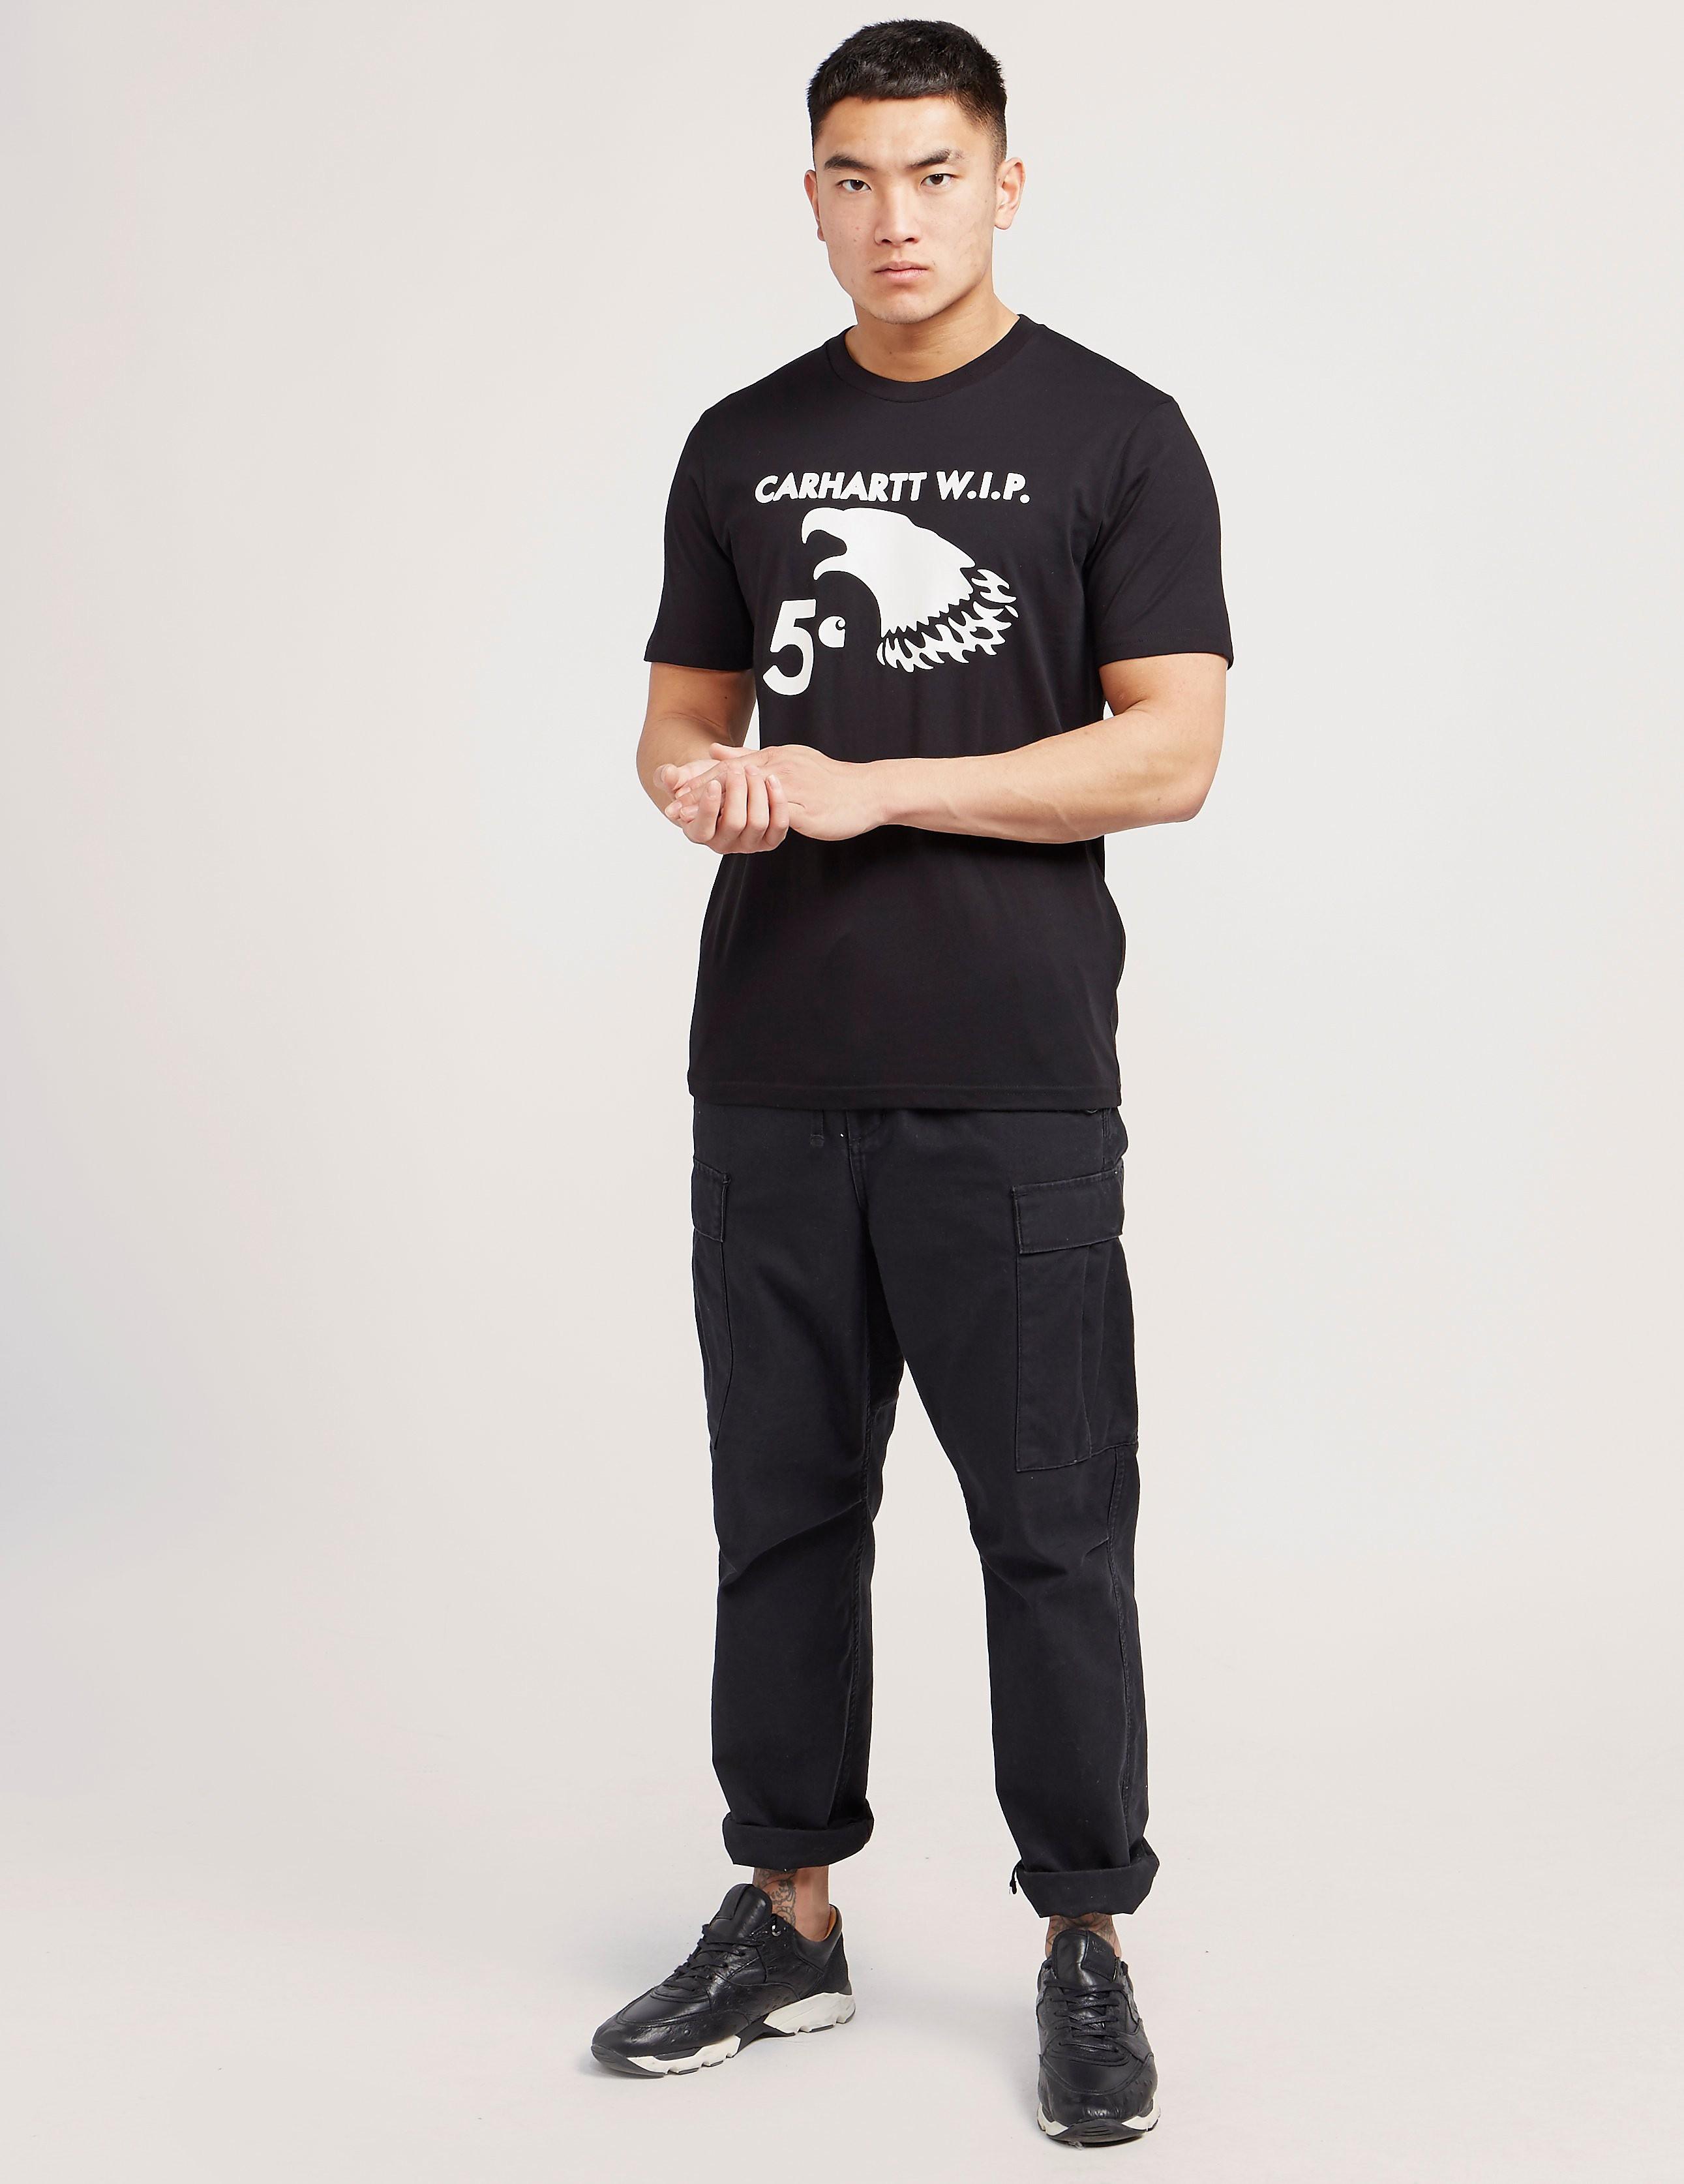 Carhartt WIP Cent Eagle Short Sleeve T-Shirt